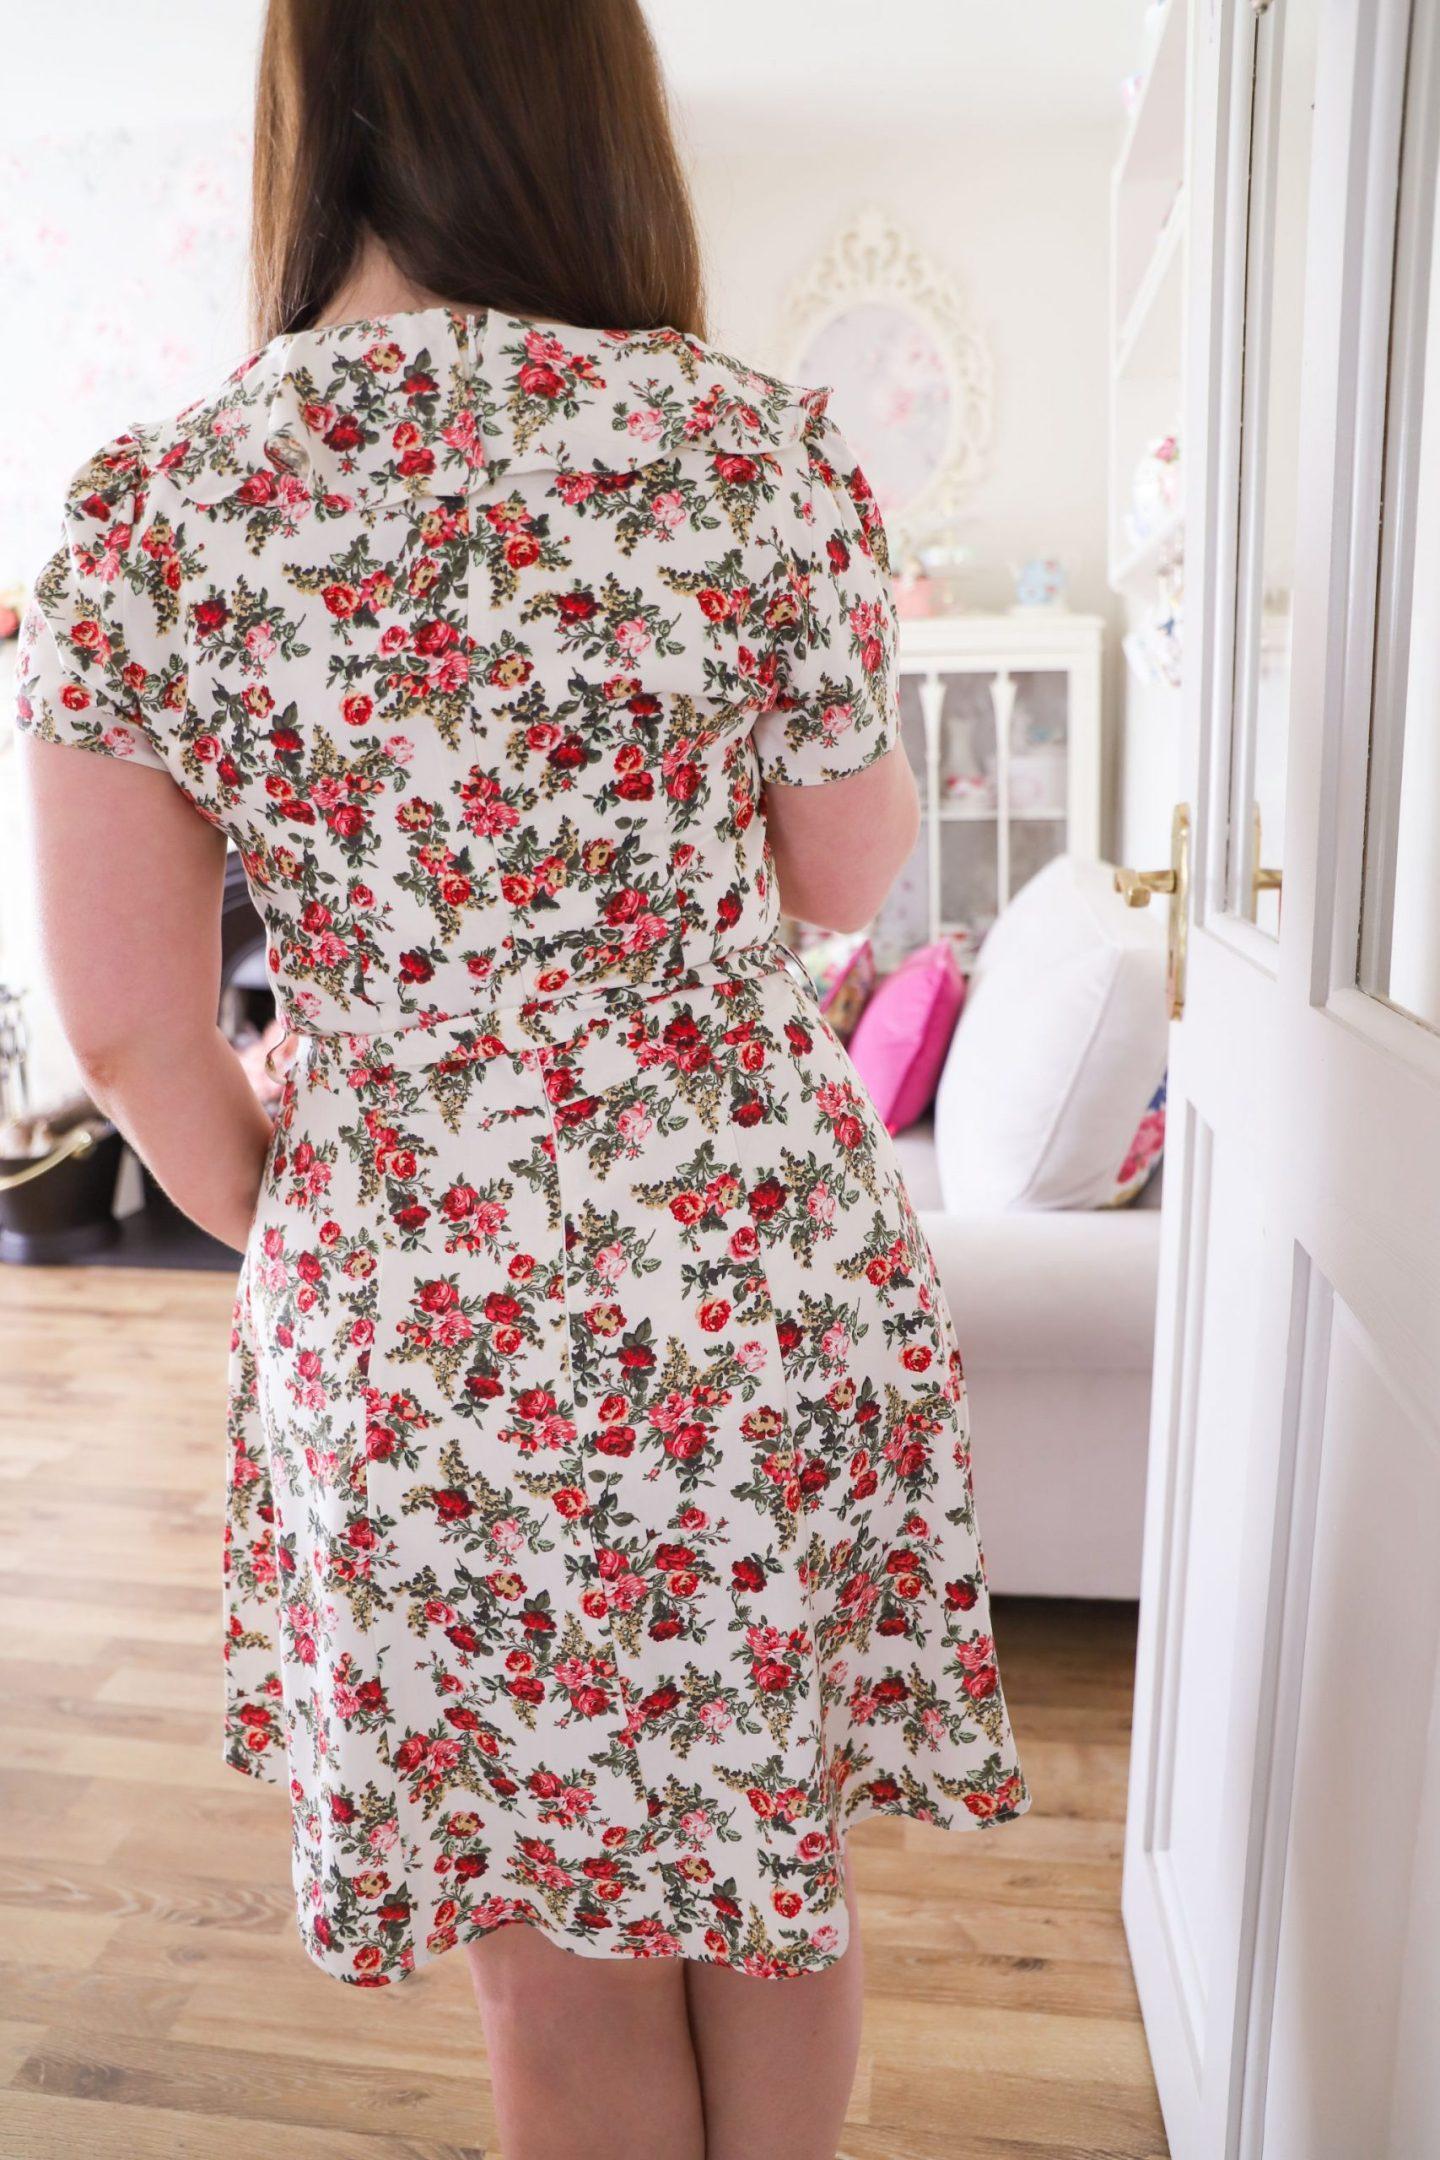 How to shorten a midi dress